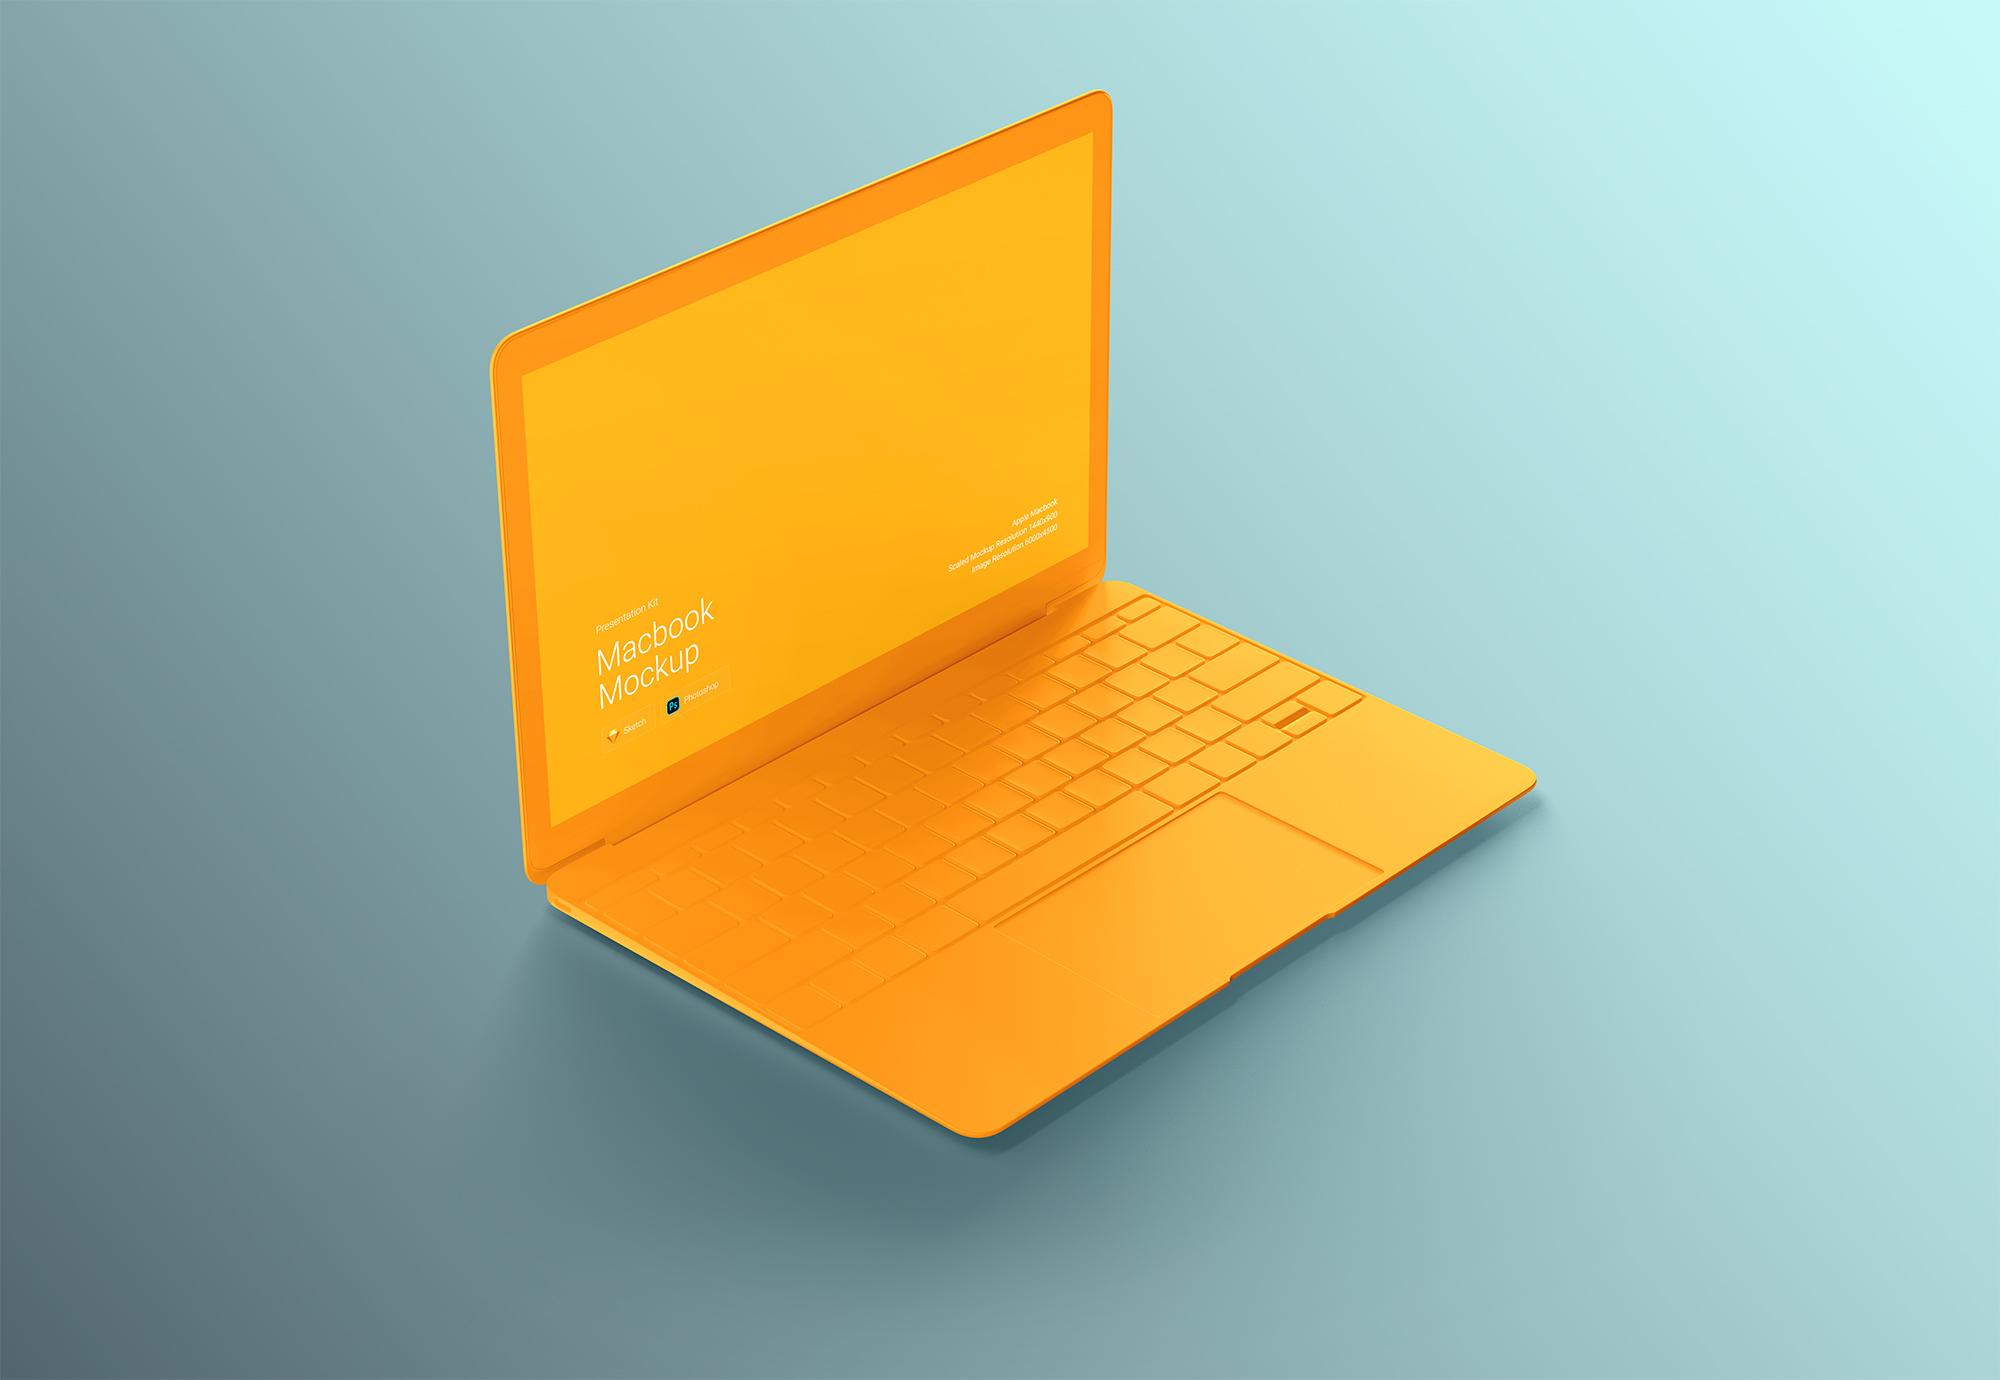 Download Macbook Macbook Pro Mockups for Sketch and Photoshop